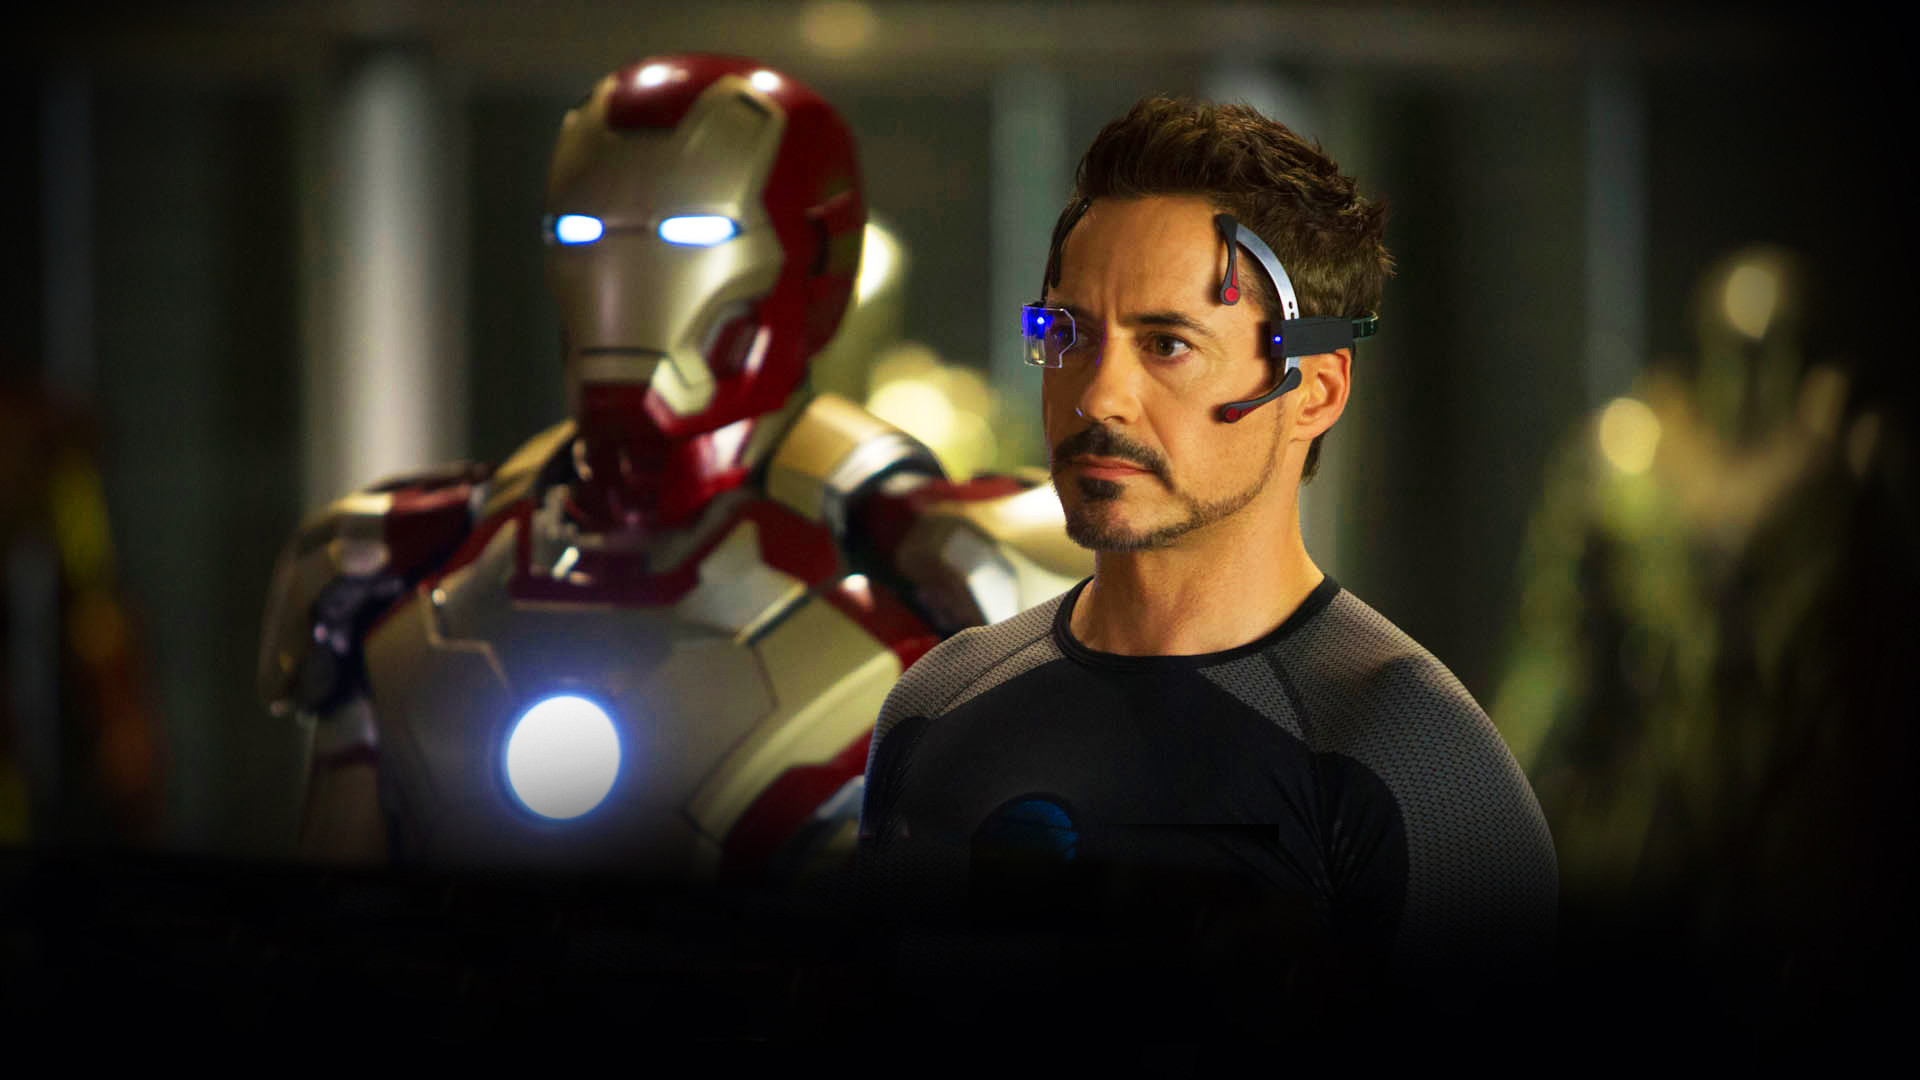 Robert Downey Jr Iron Man Wallpaper 71 Images